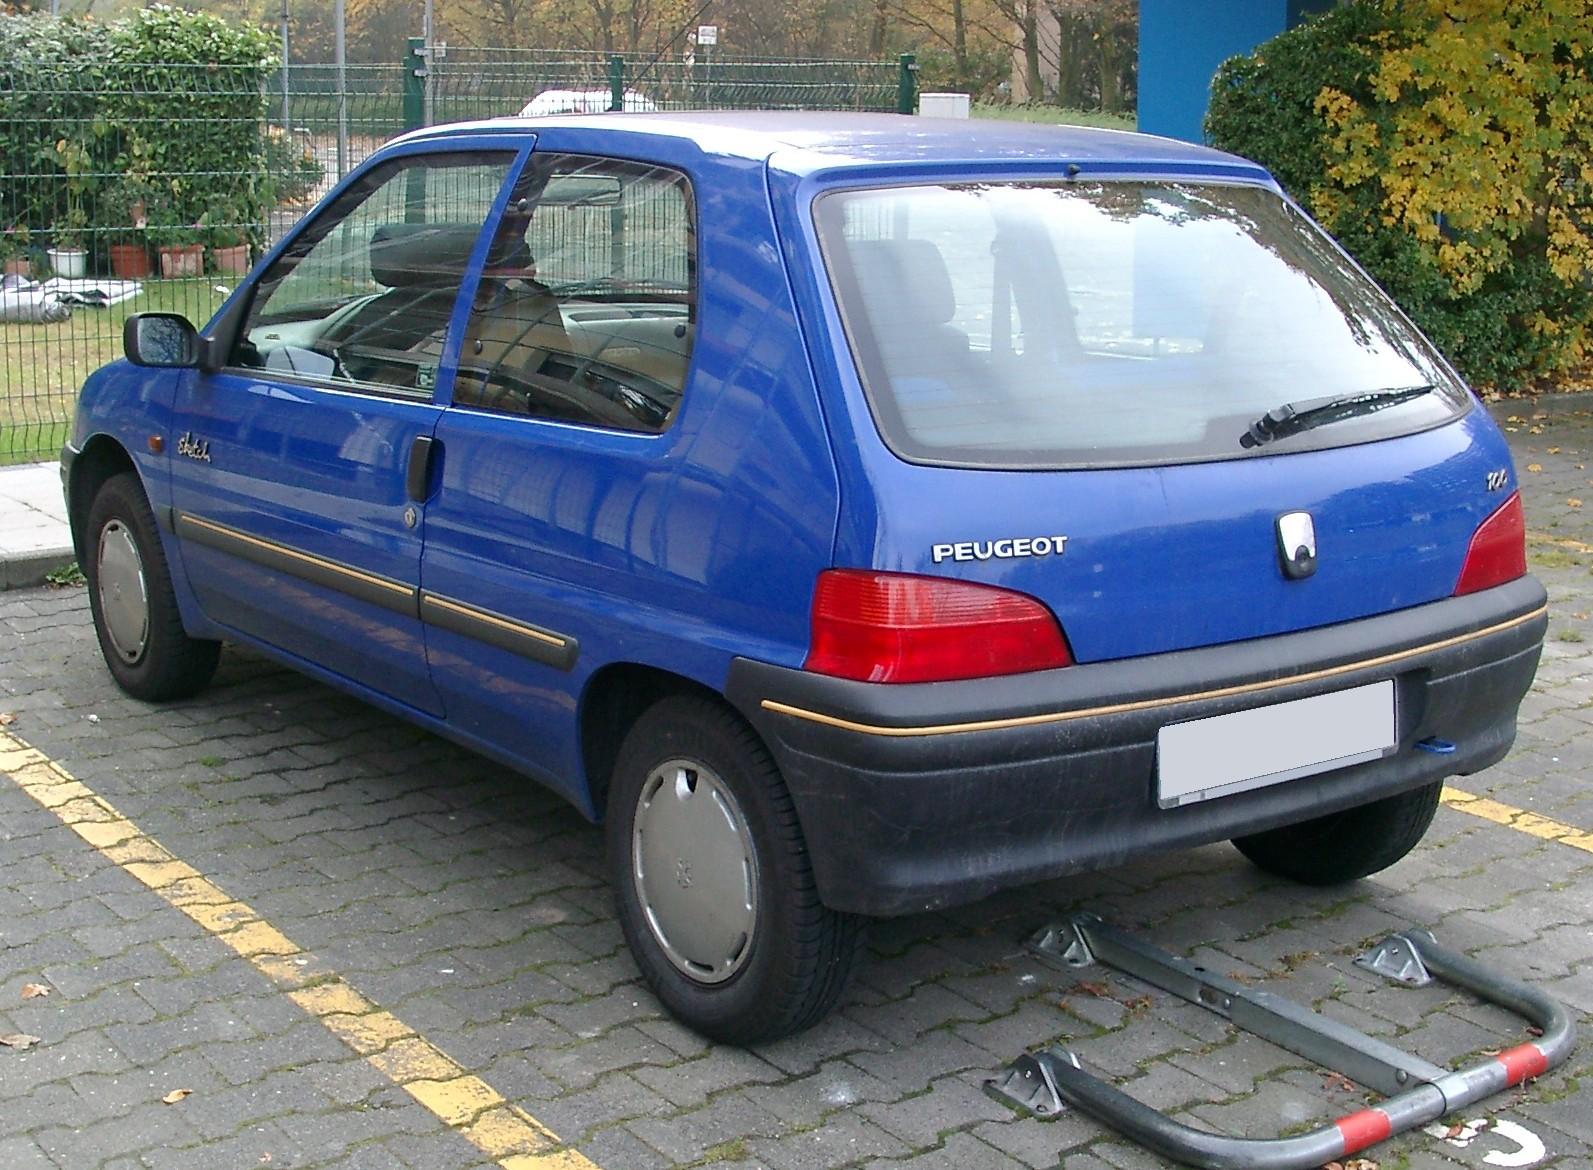 File:Peugeot 106 Rear 20071031.jpg